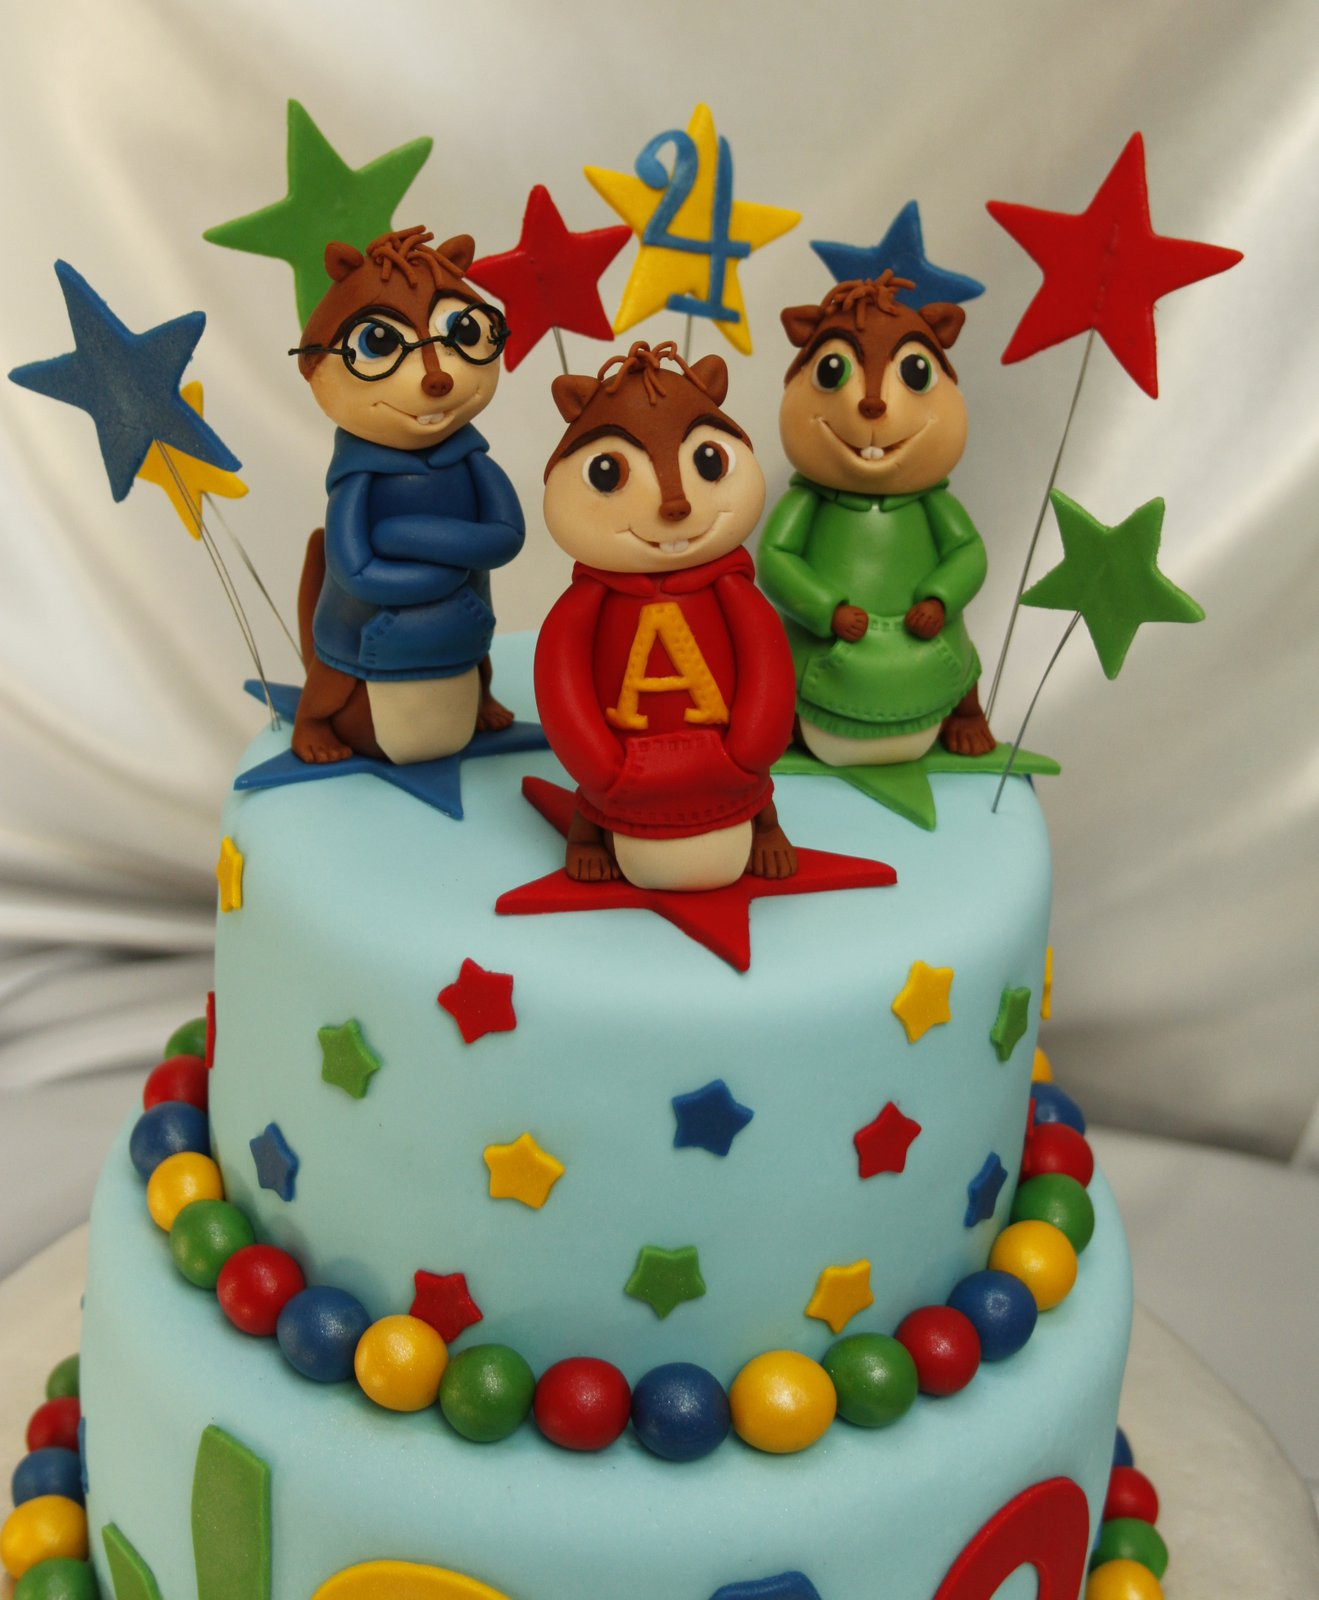 Alvin And The Chipmunks Birthday Cake  Amazing Grace Cakes Alvin and The Chipmunks